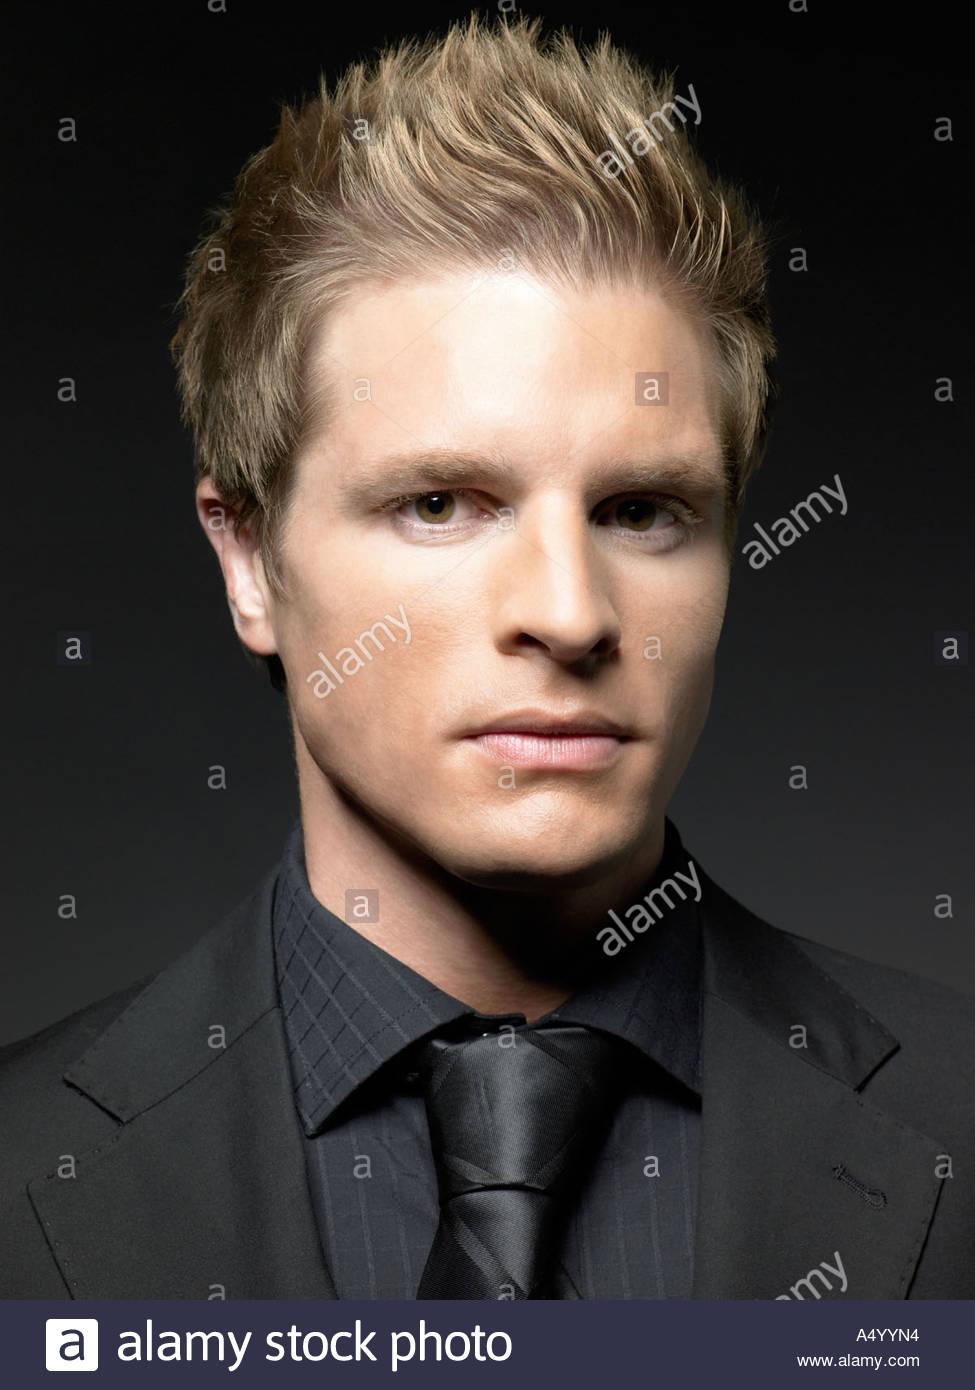 Young man wearing black - Stock Image